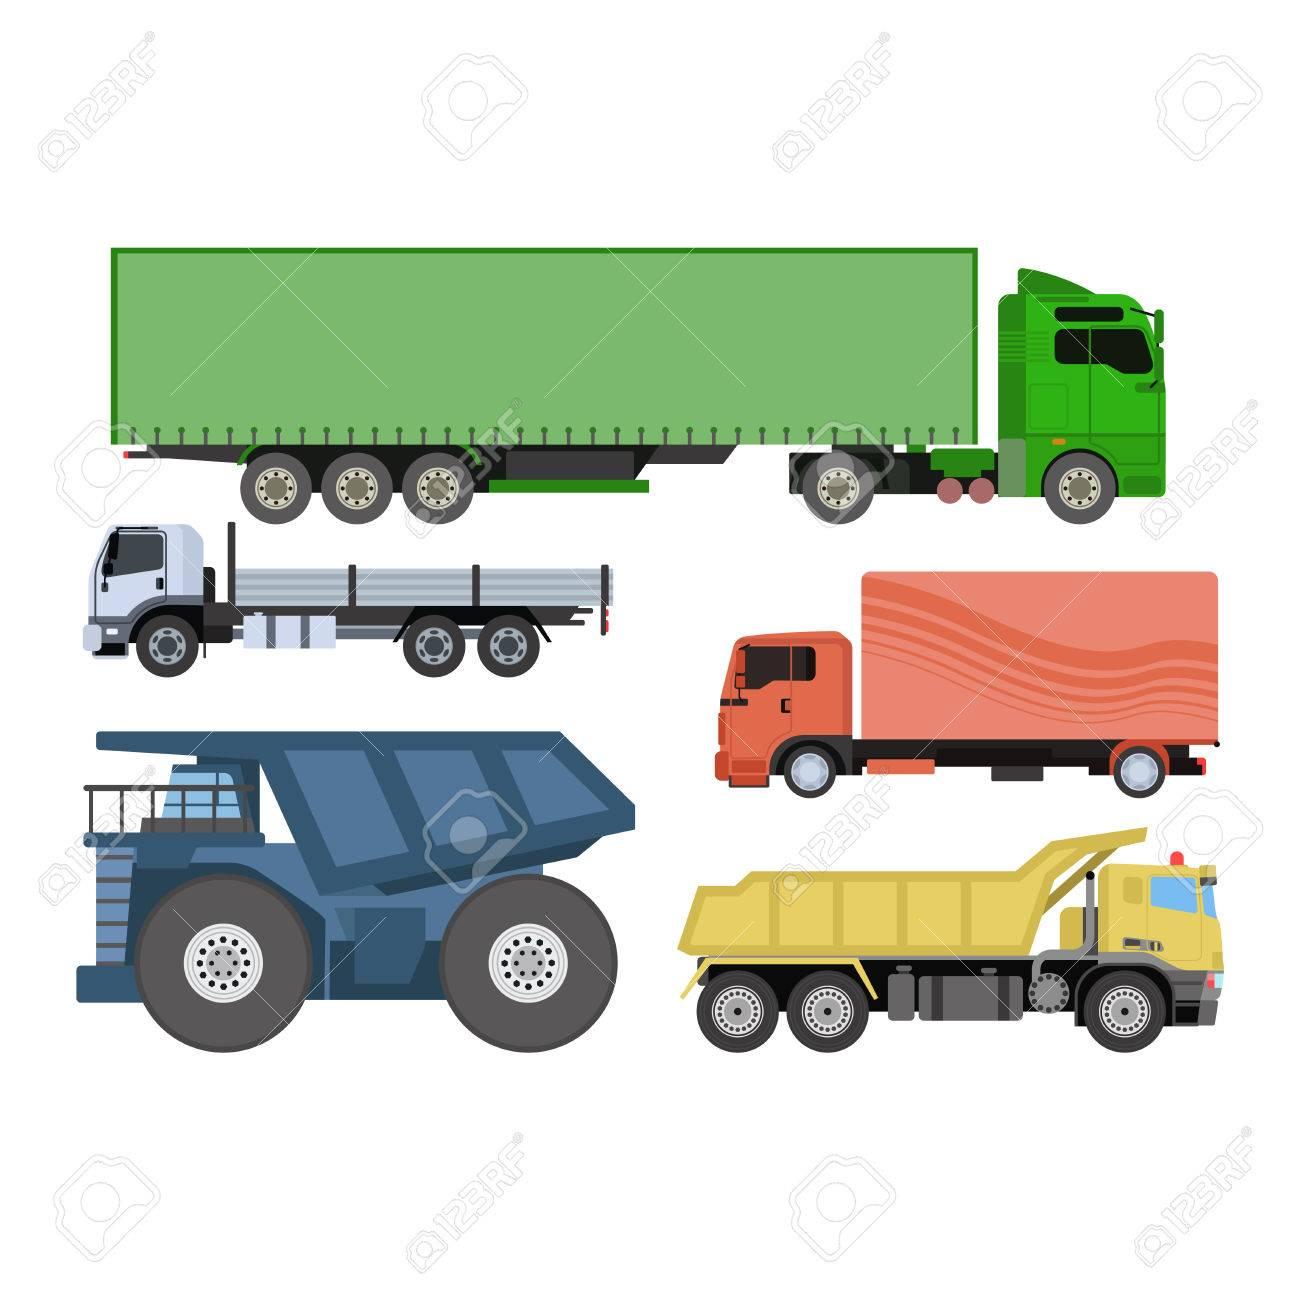 Trucks icons vector shipping cars vehicles cargo transportation